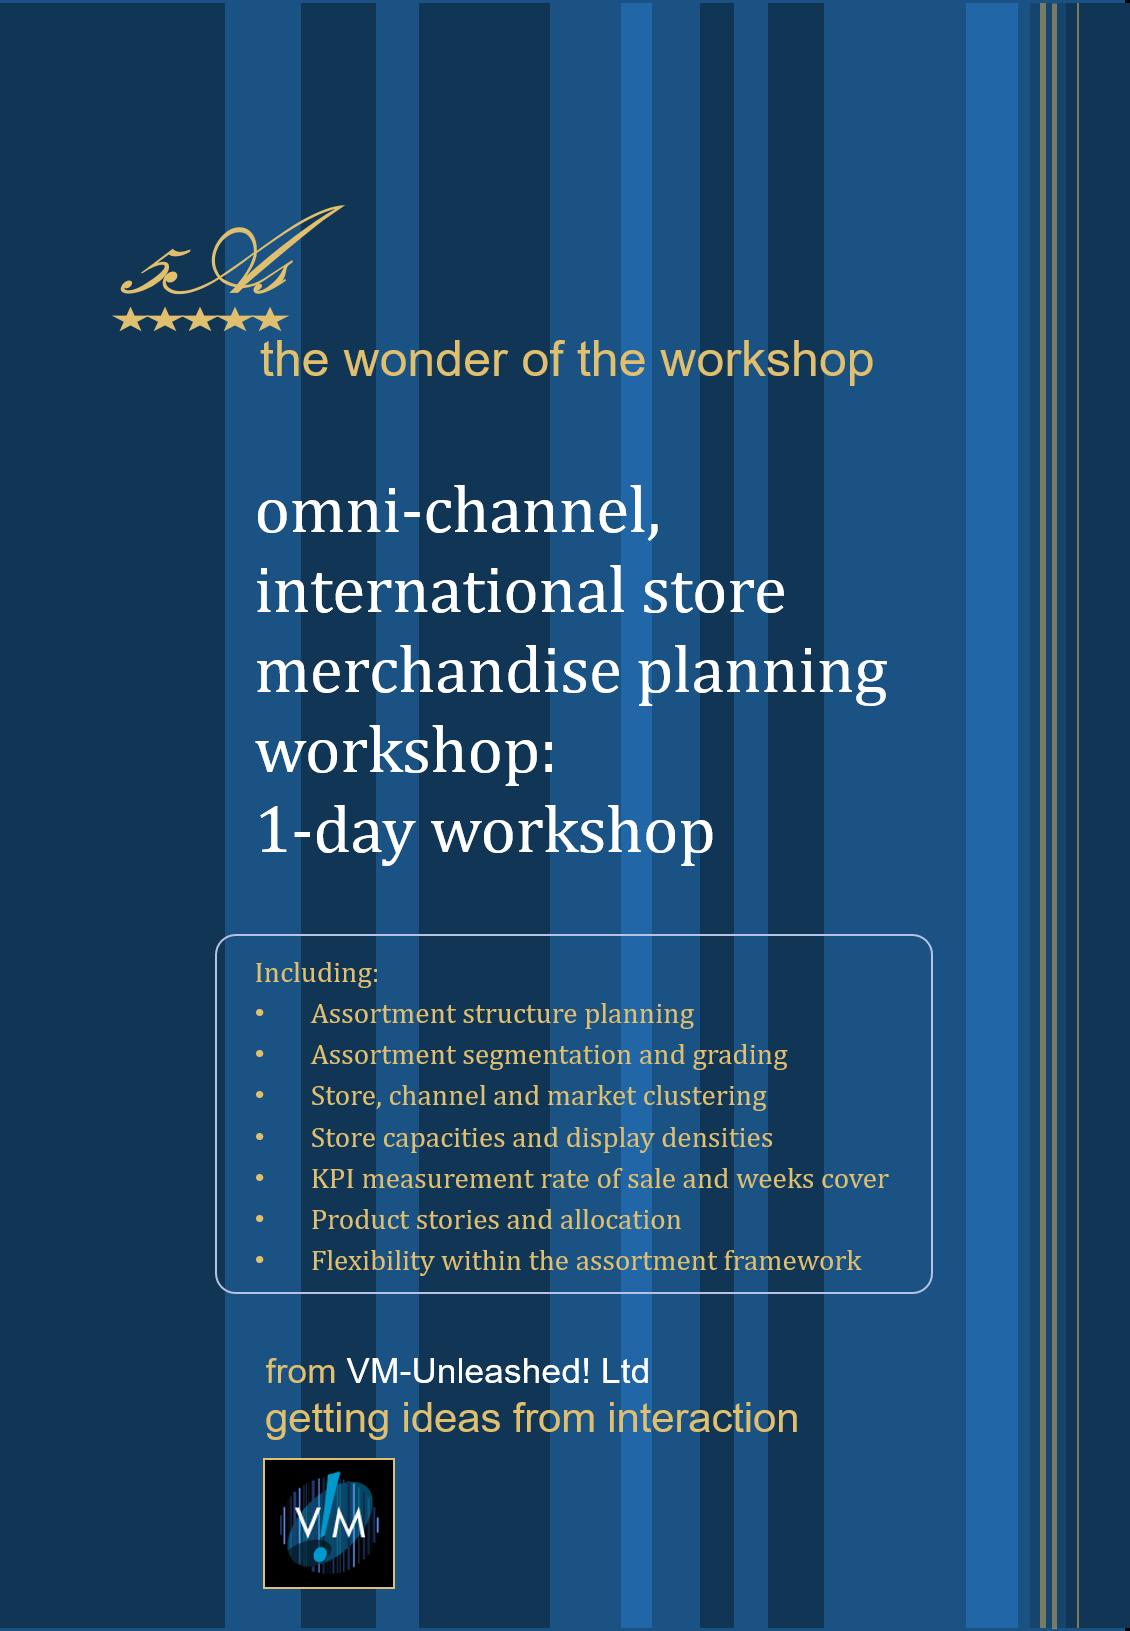 vm-unleashed-workshop-vmtookit-omnichannel-international-expansion-merchandise-planning